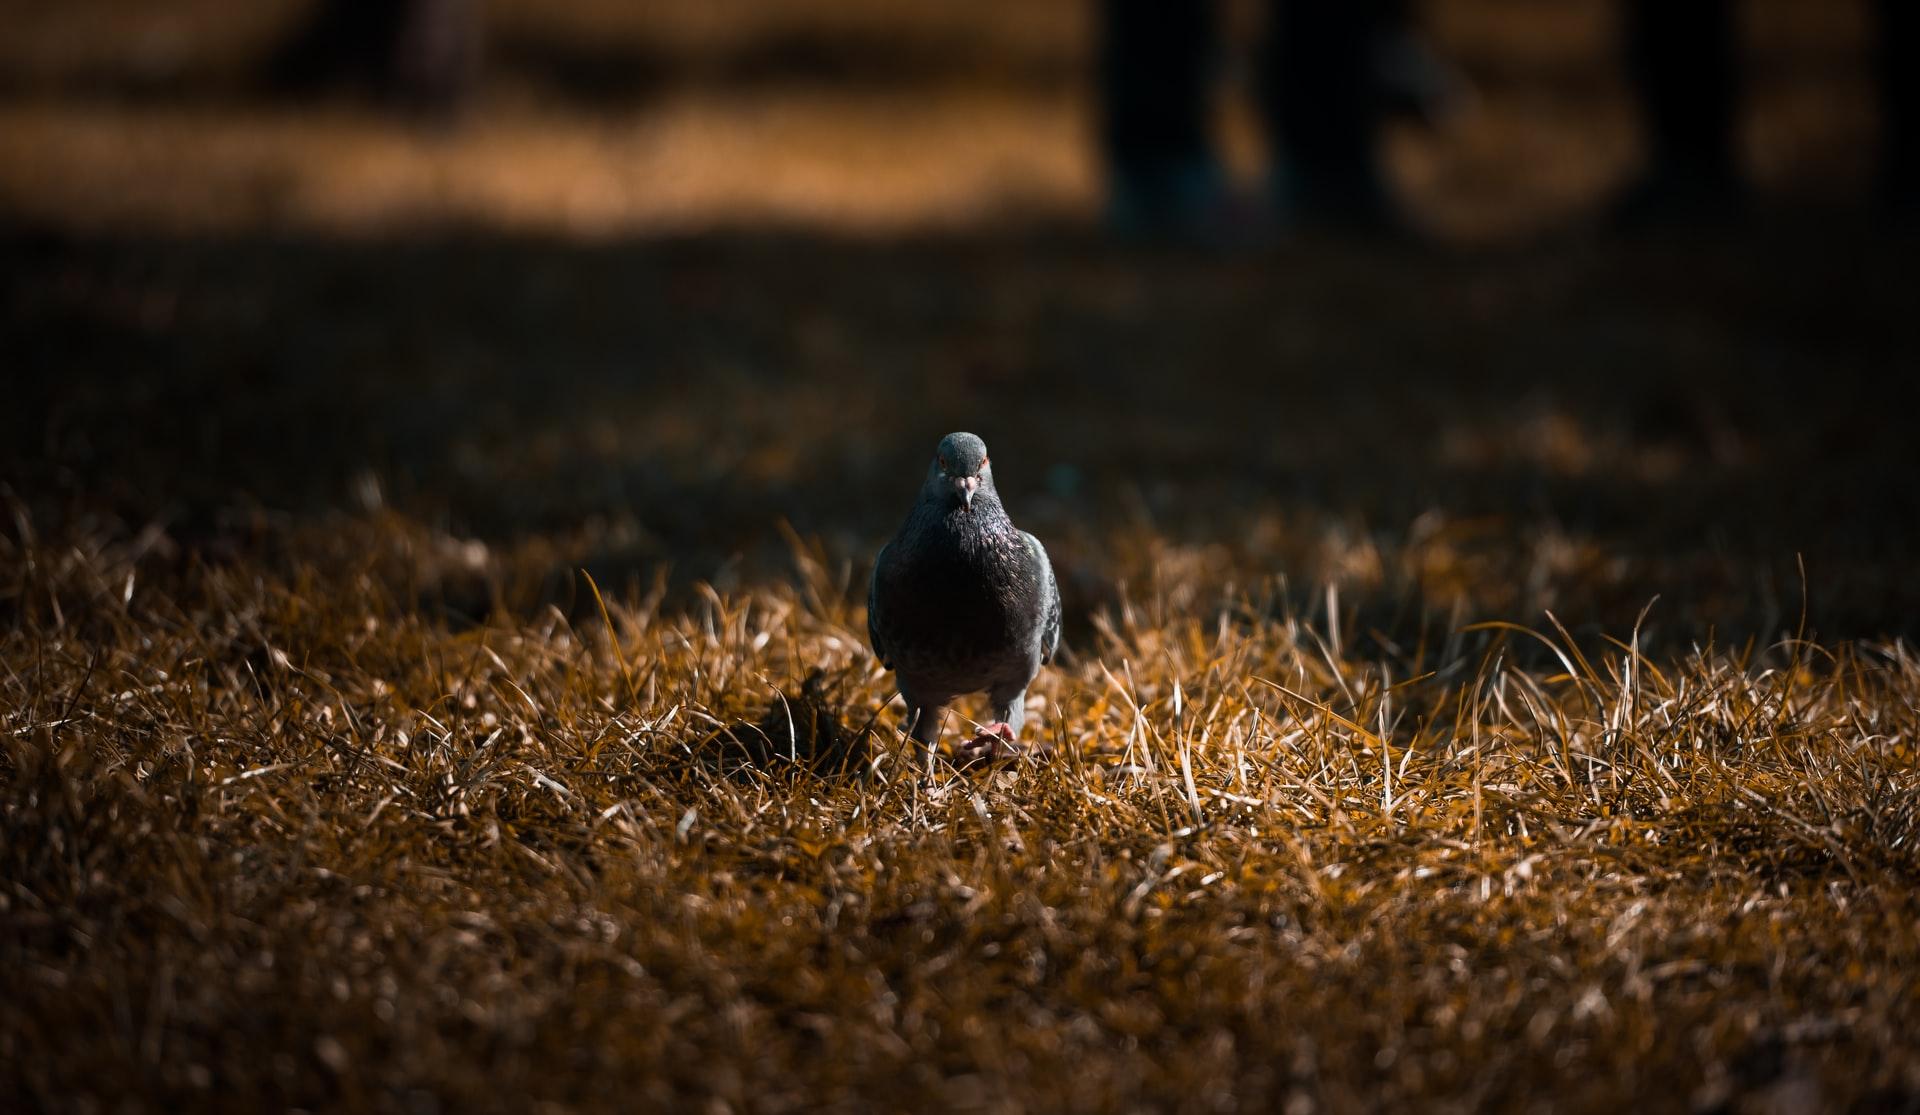 golub pismonoša